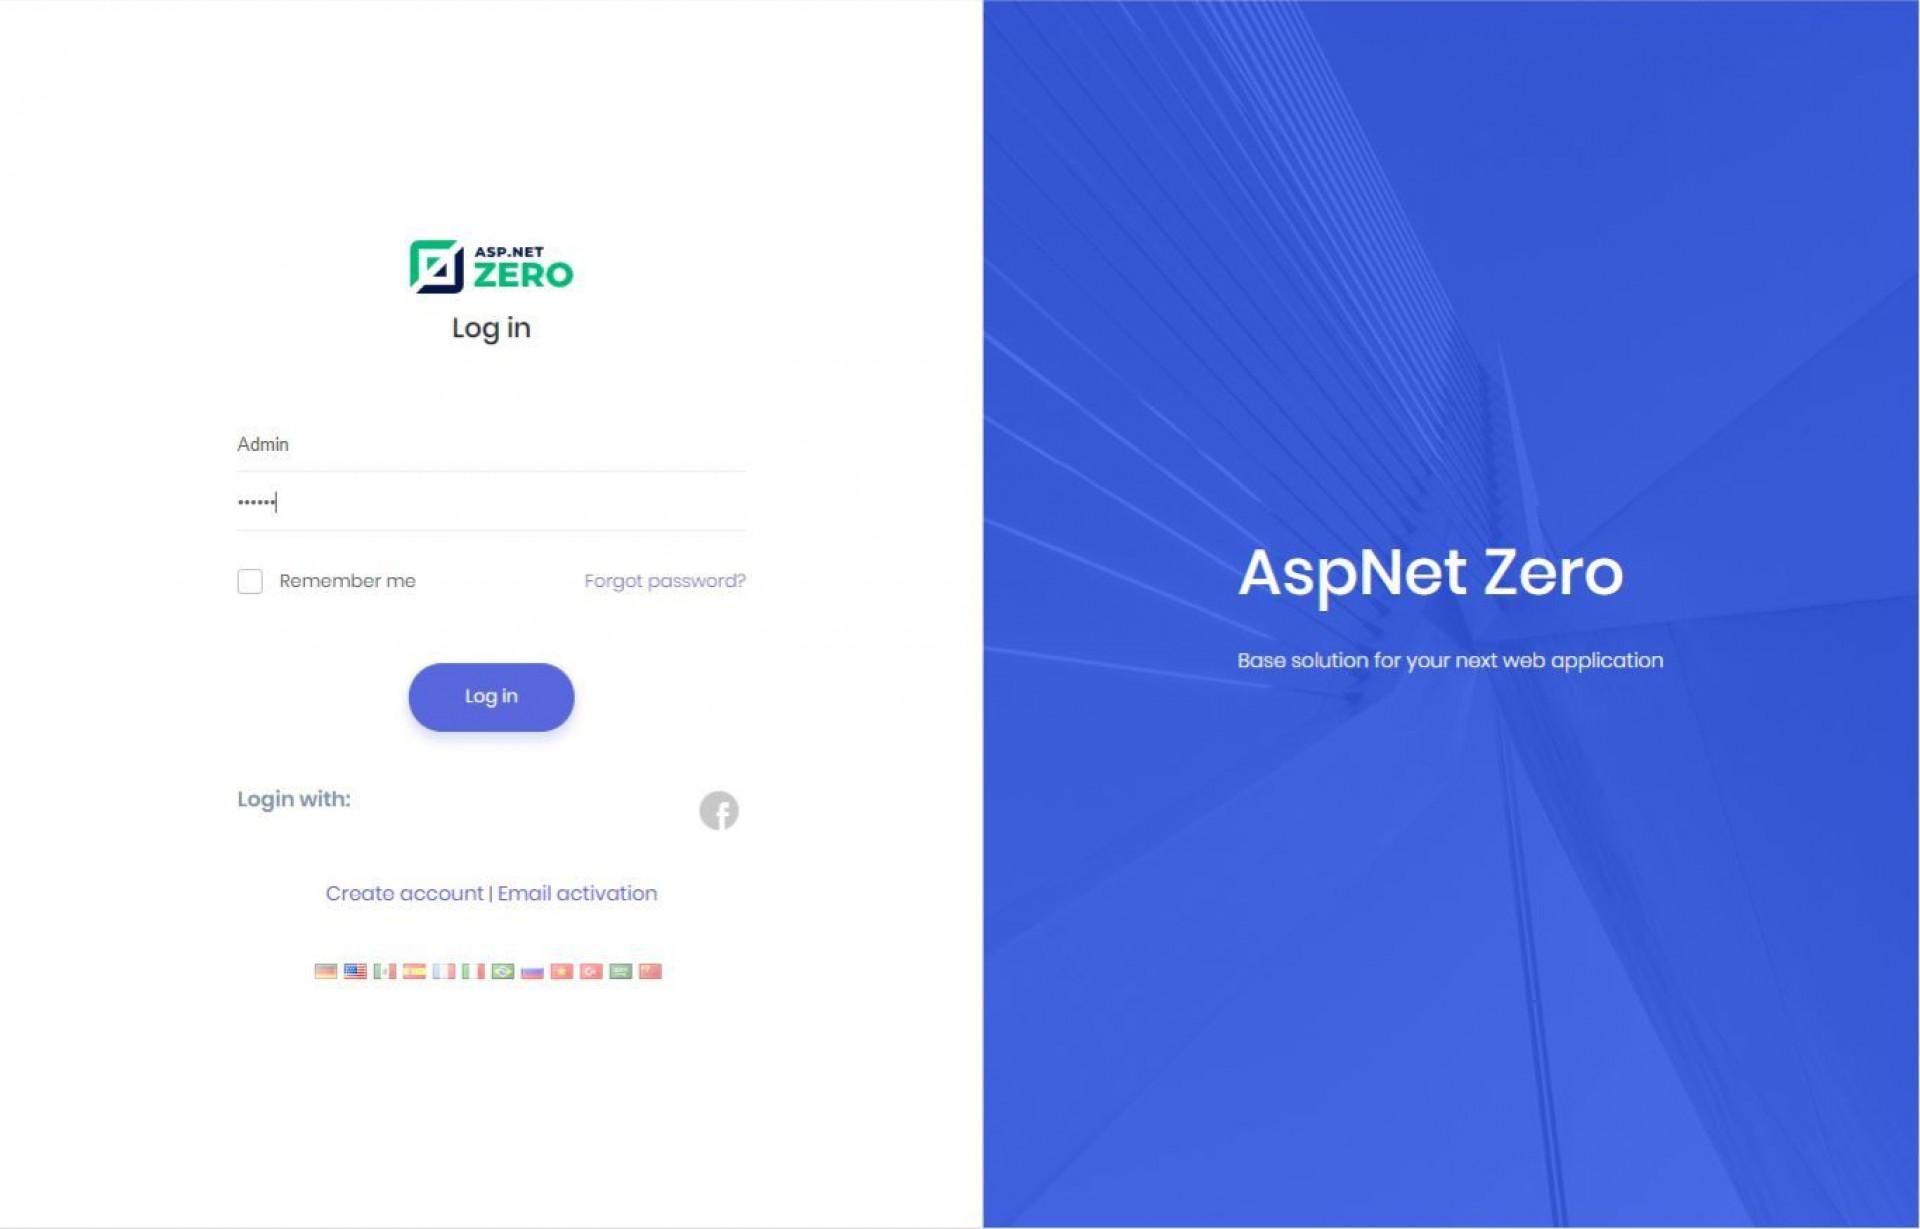 007 Exceptional Web Page Design Template In Asp Net Idea  Asp.net1920